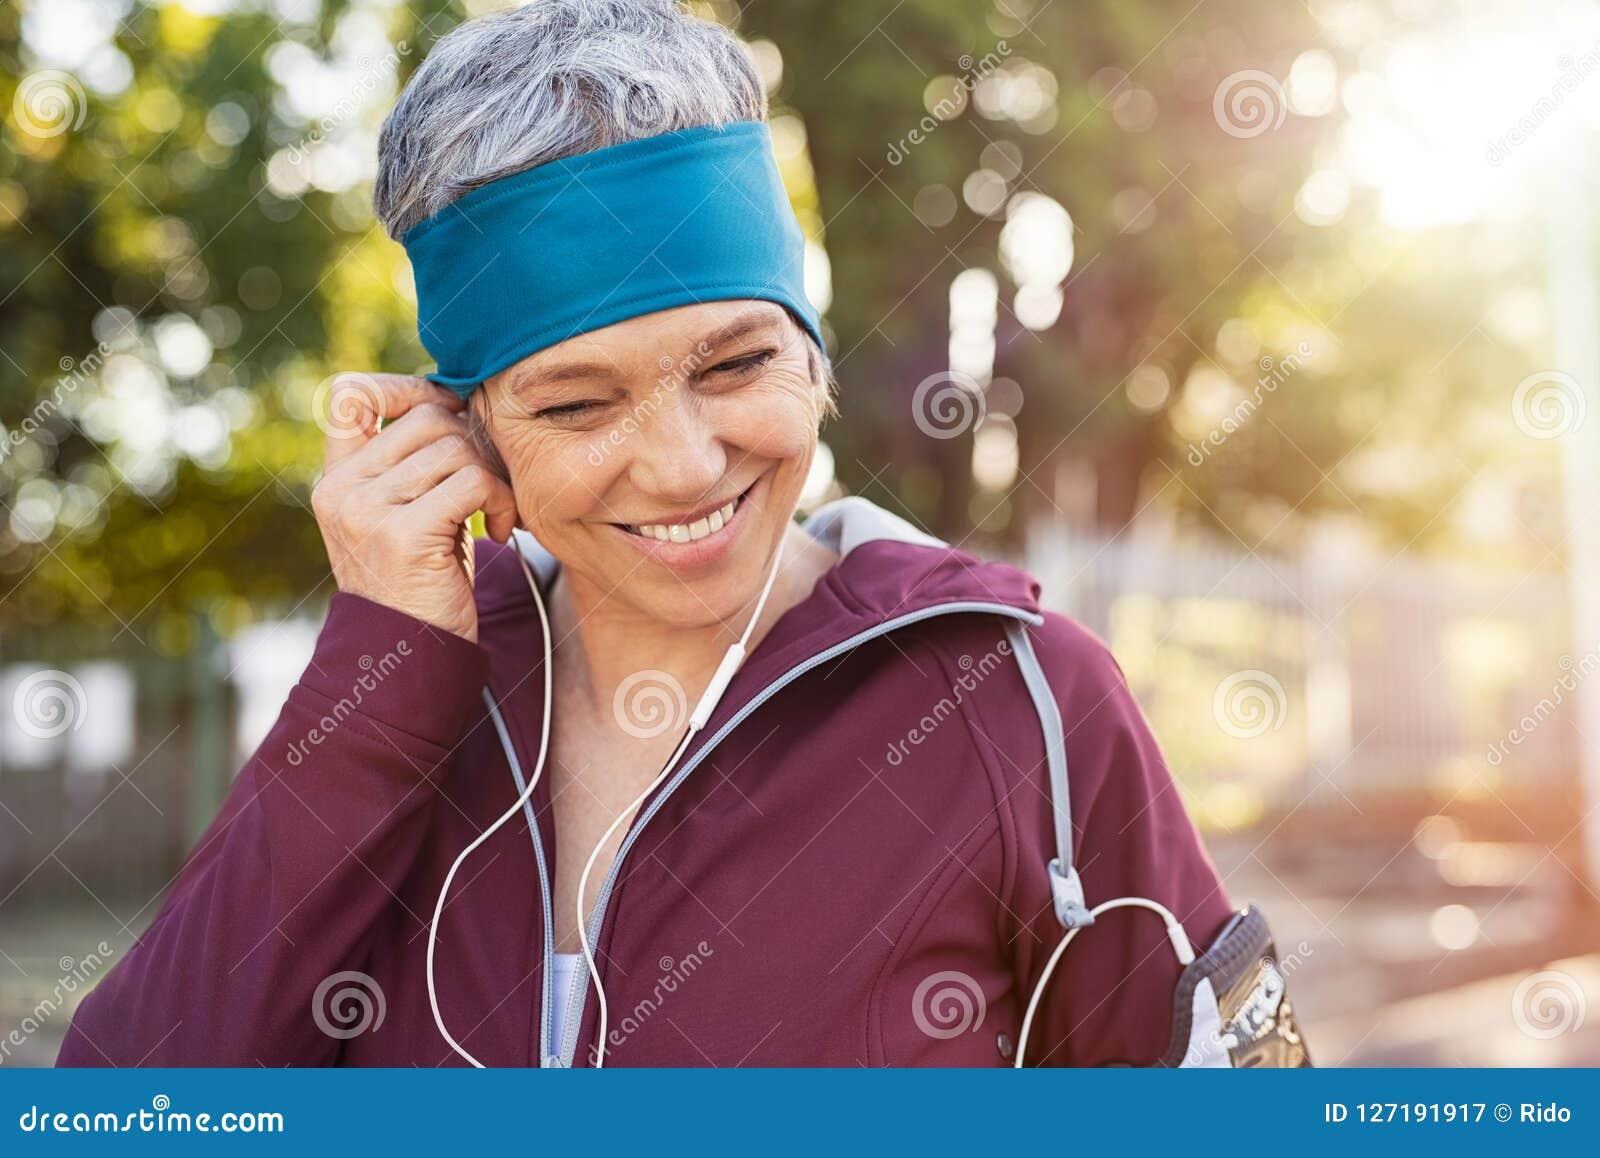 Mature woman adjusting earphones before running